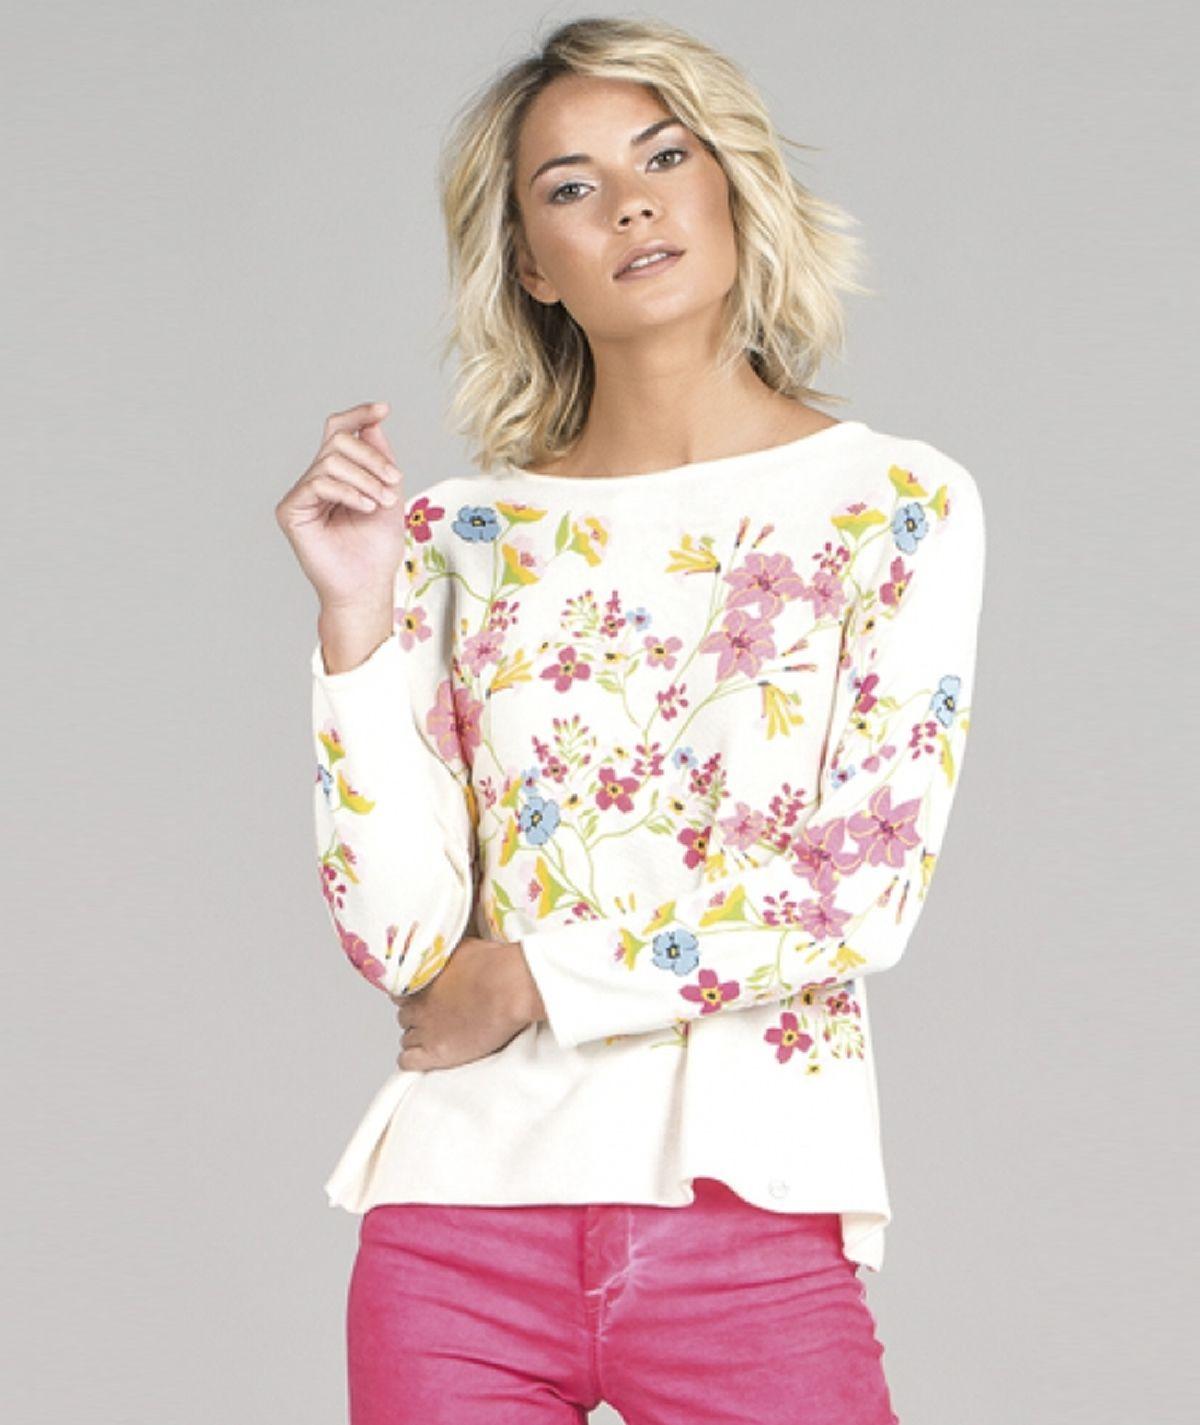 Camisola motivo floral